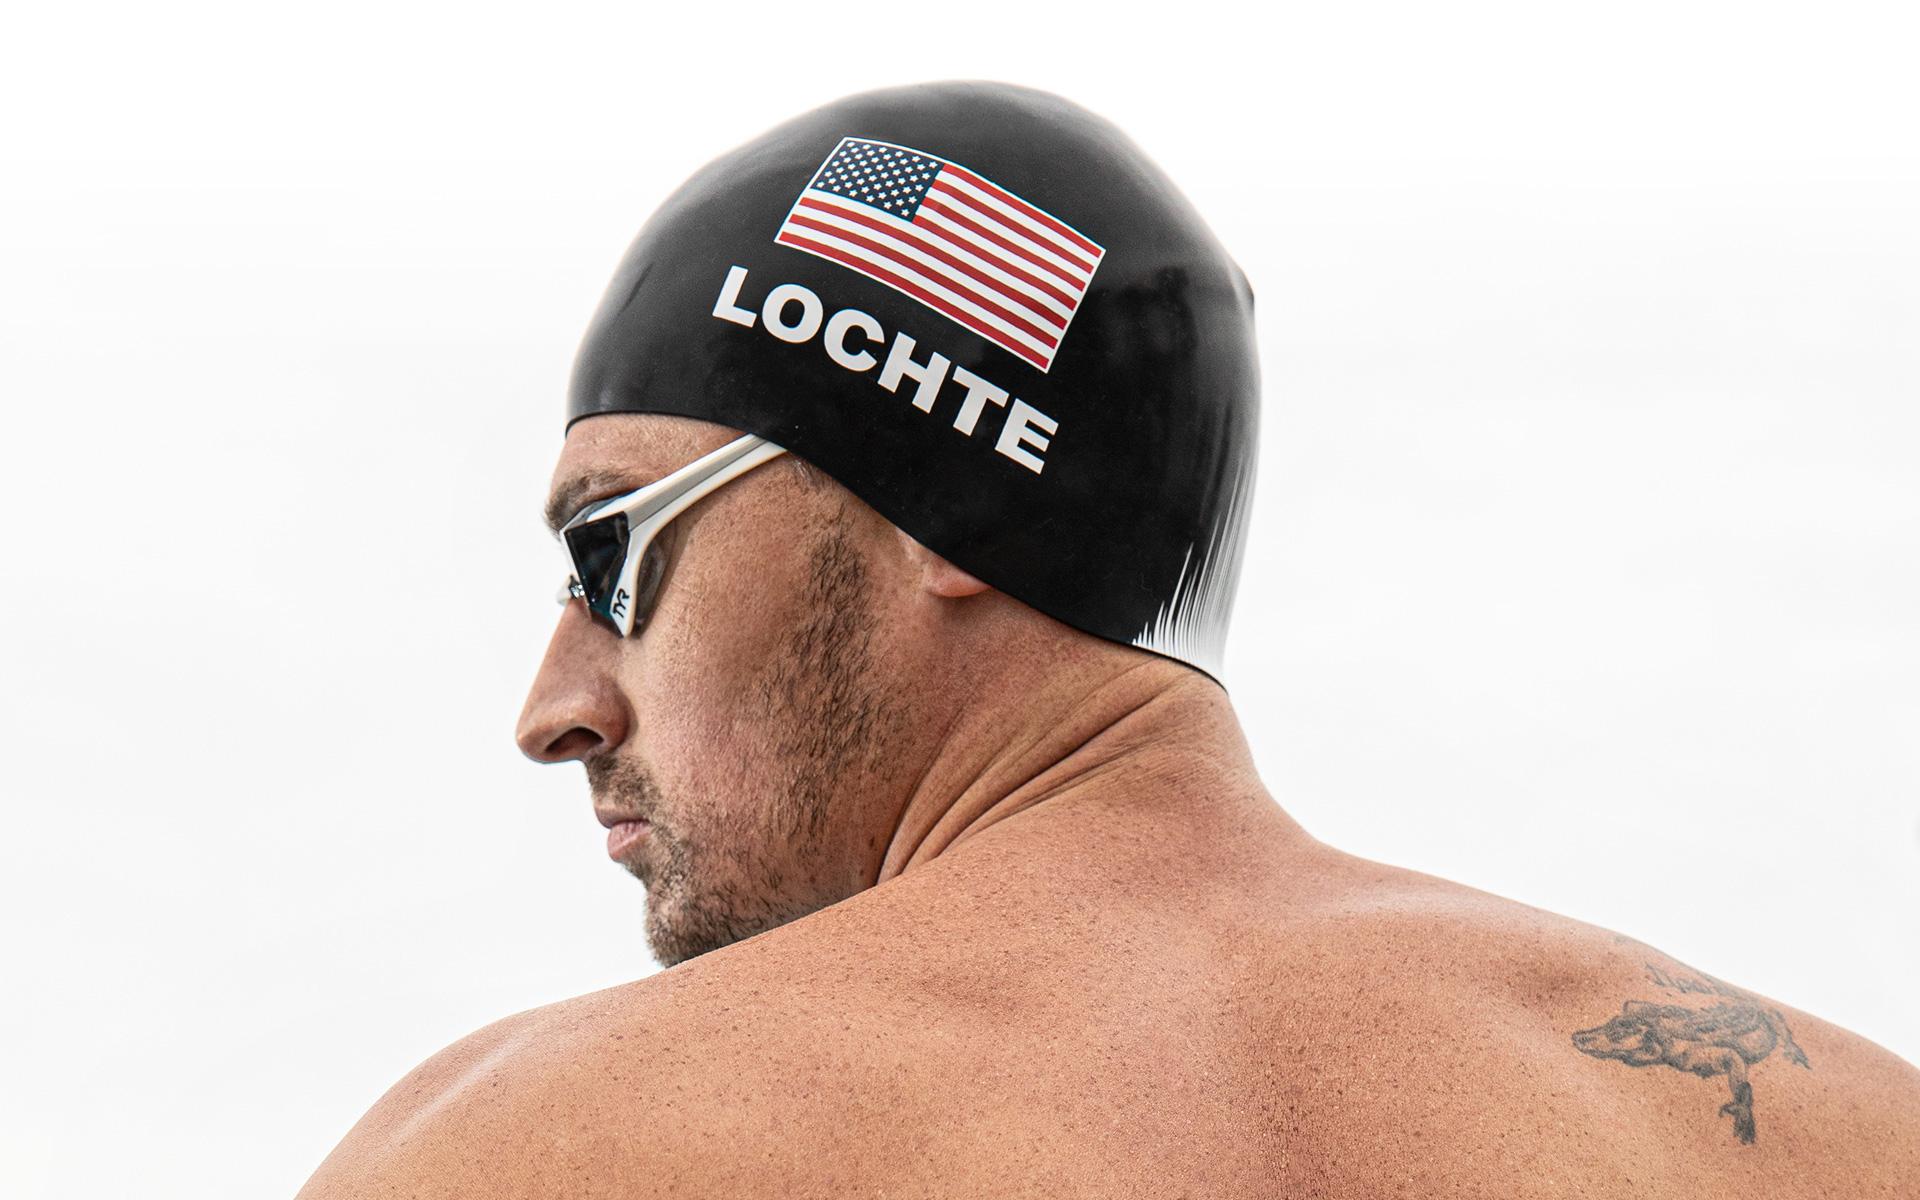 Ryan Lochte - Tracer-X Elite Goggles